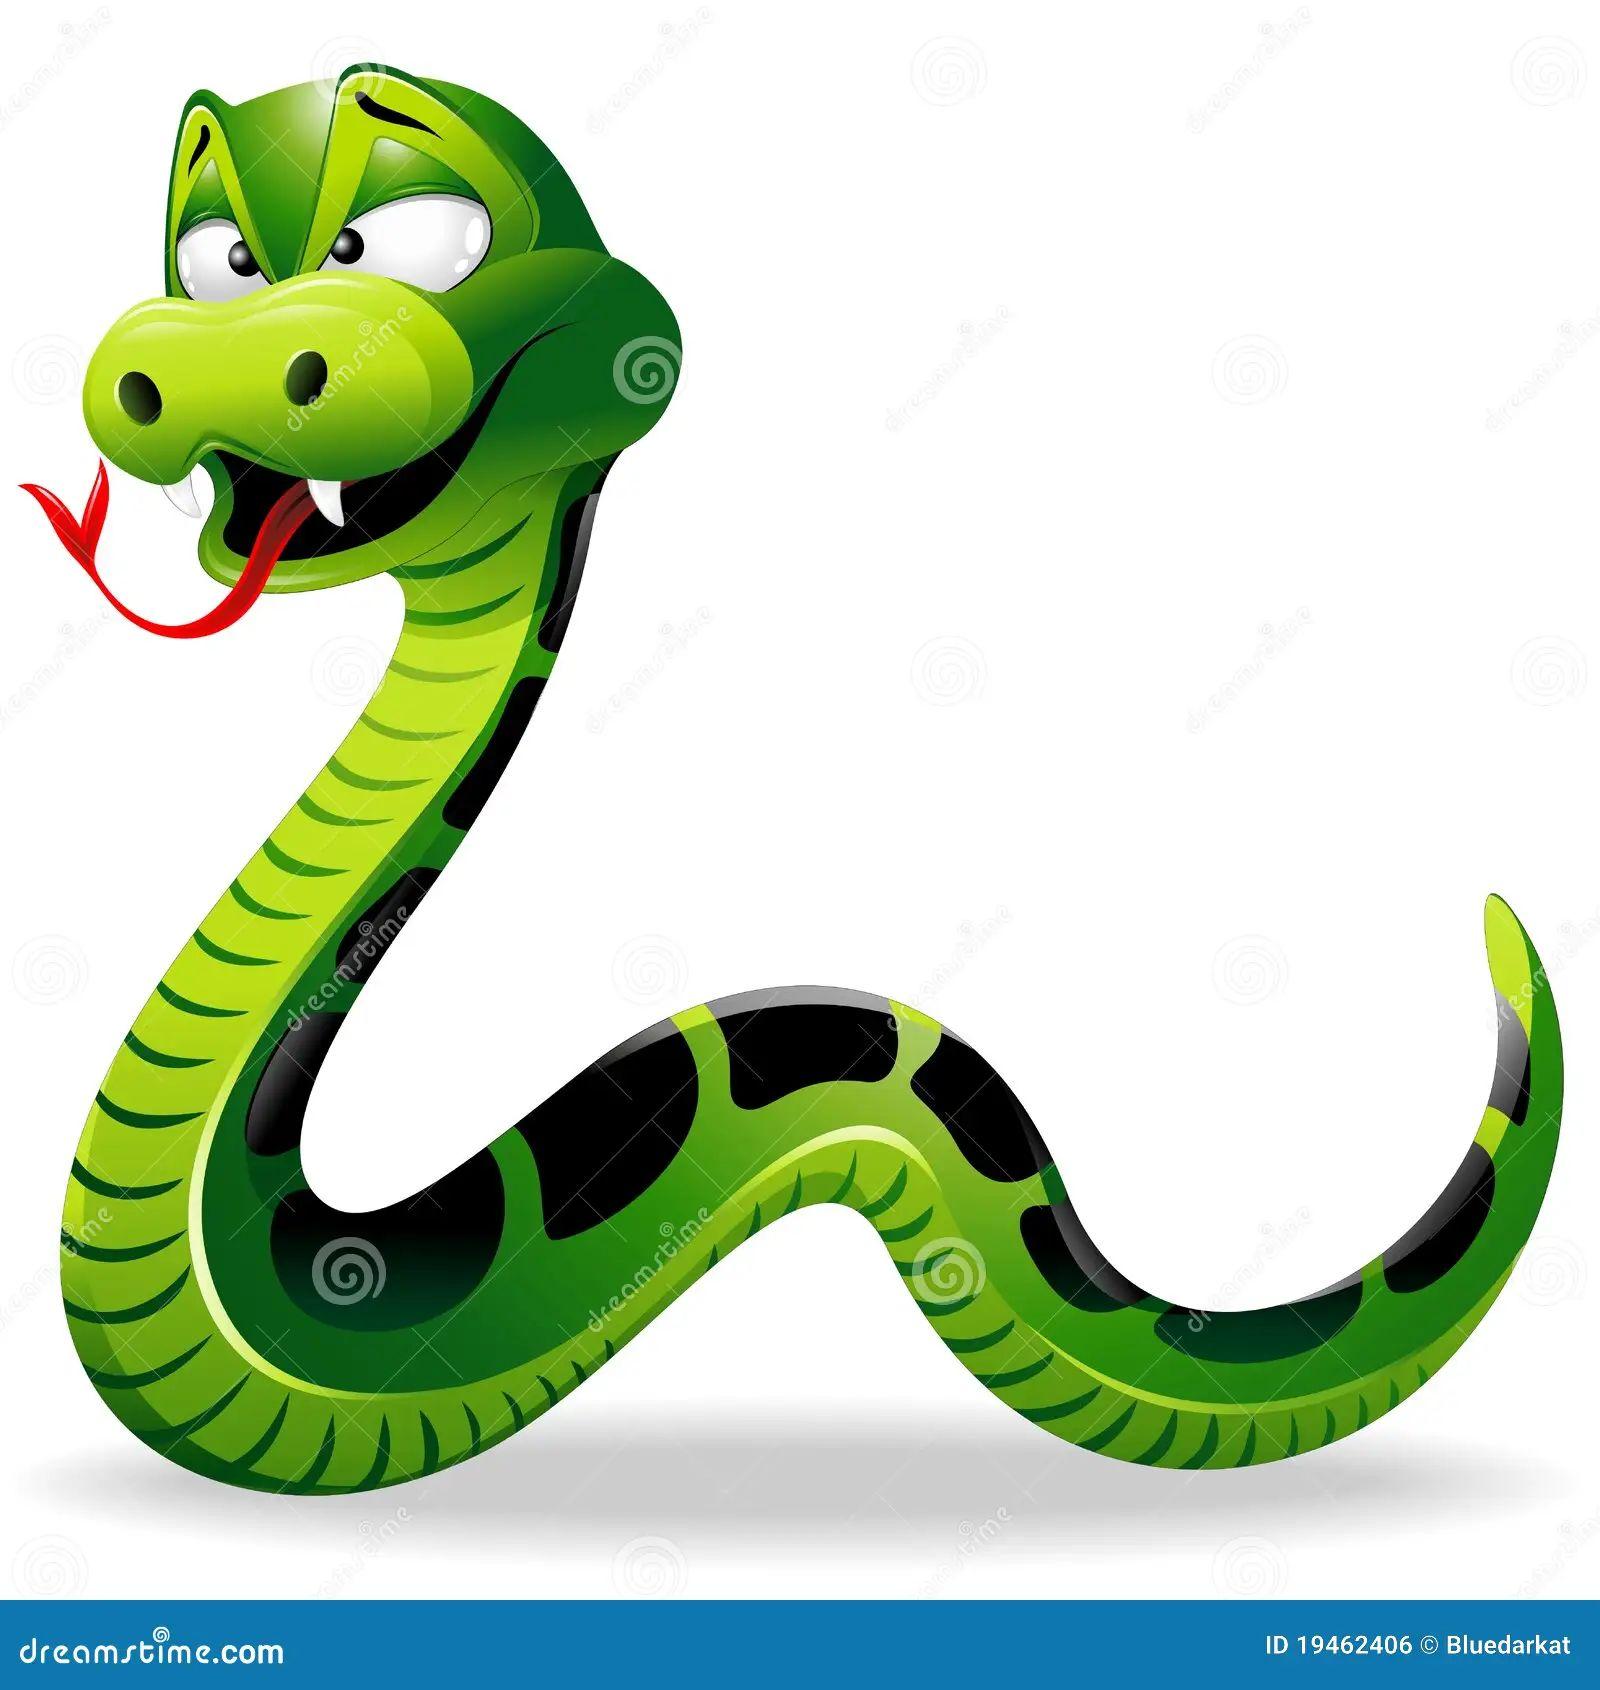 Green snake cartoon royalty free stock image